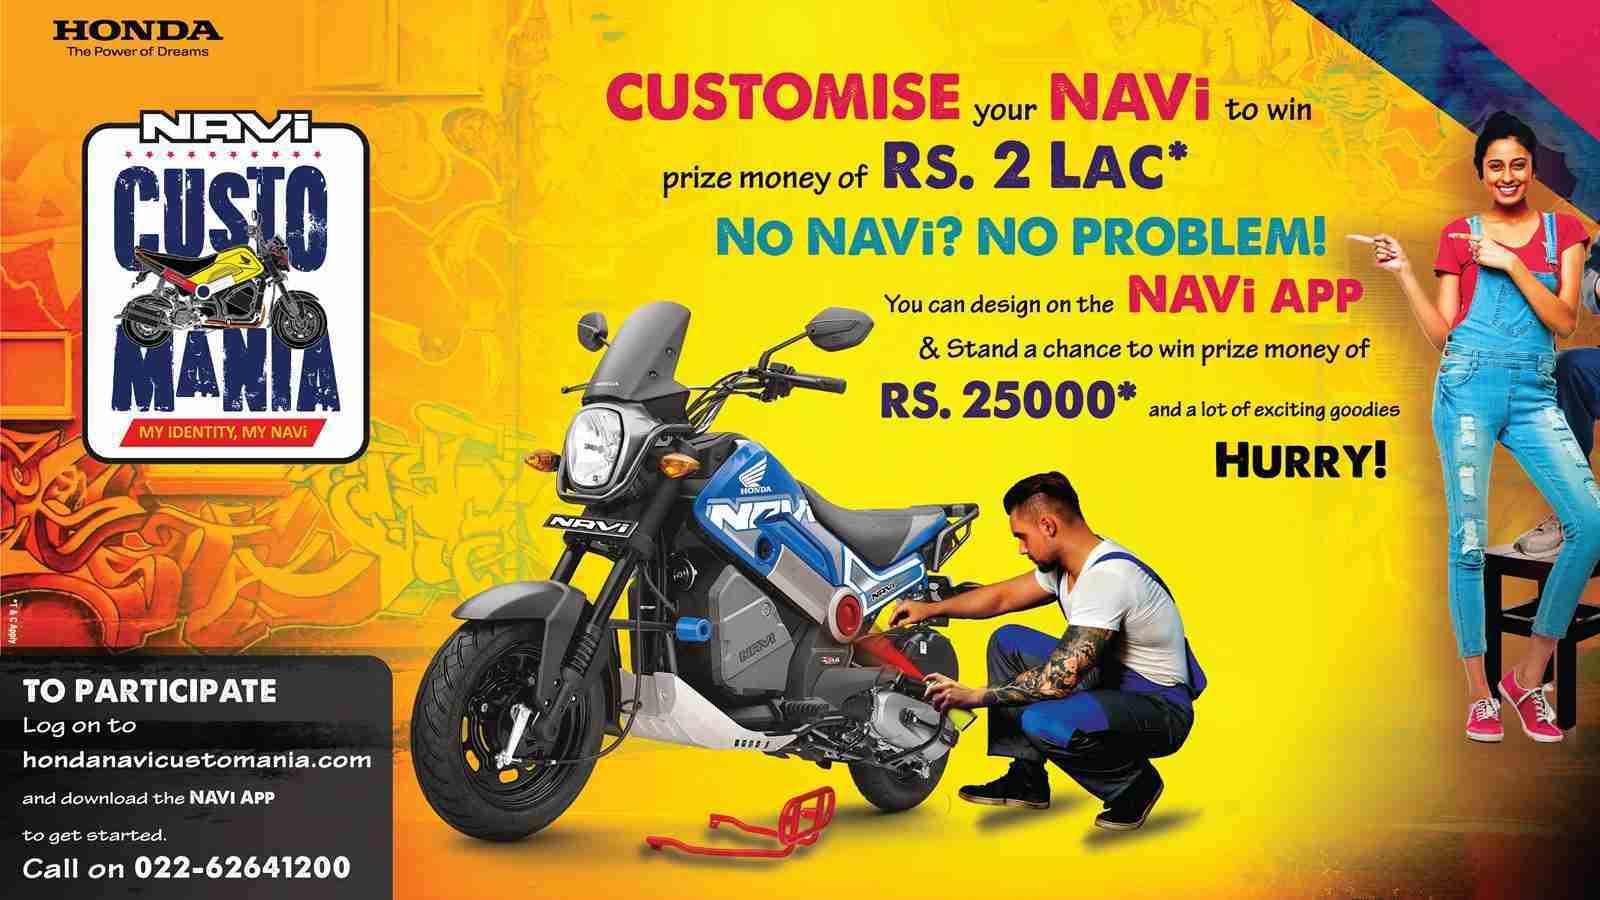 Honda Navi custom build competition